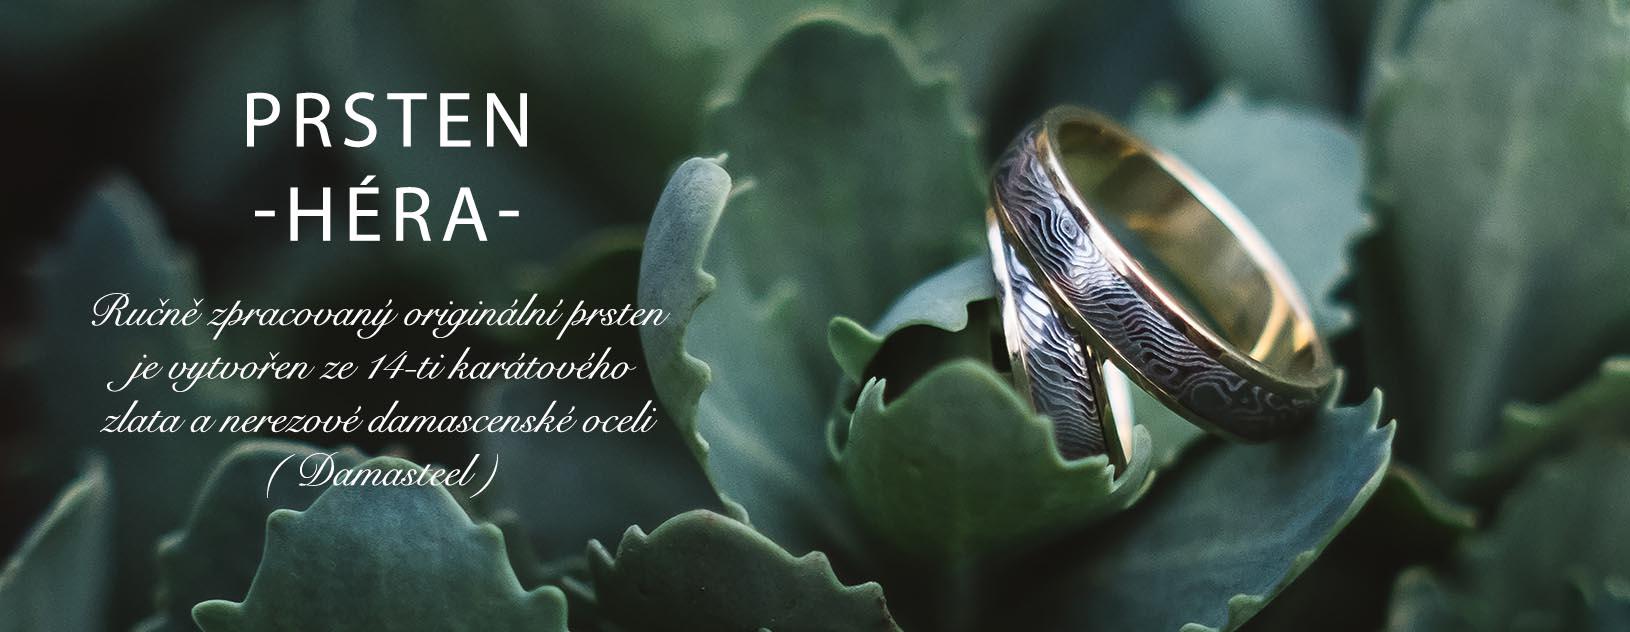 kované prsteny damasteel